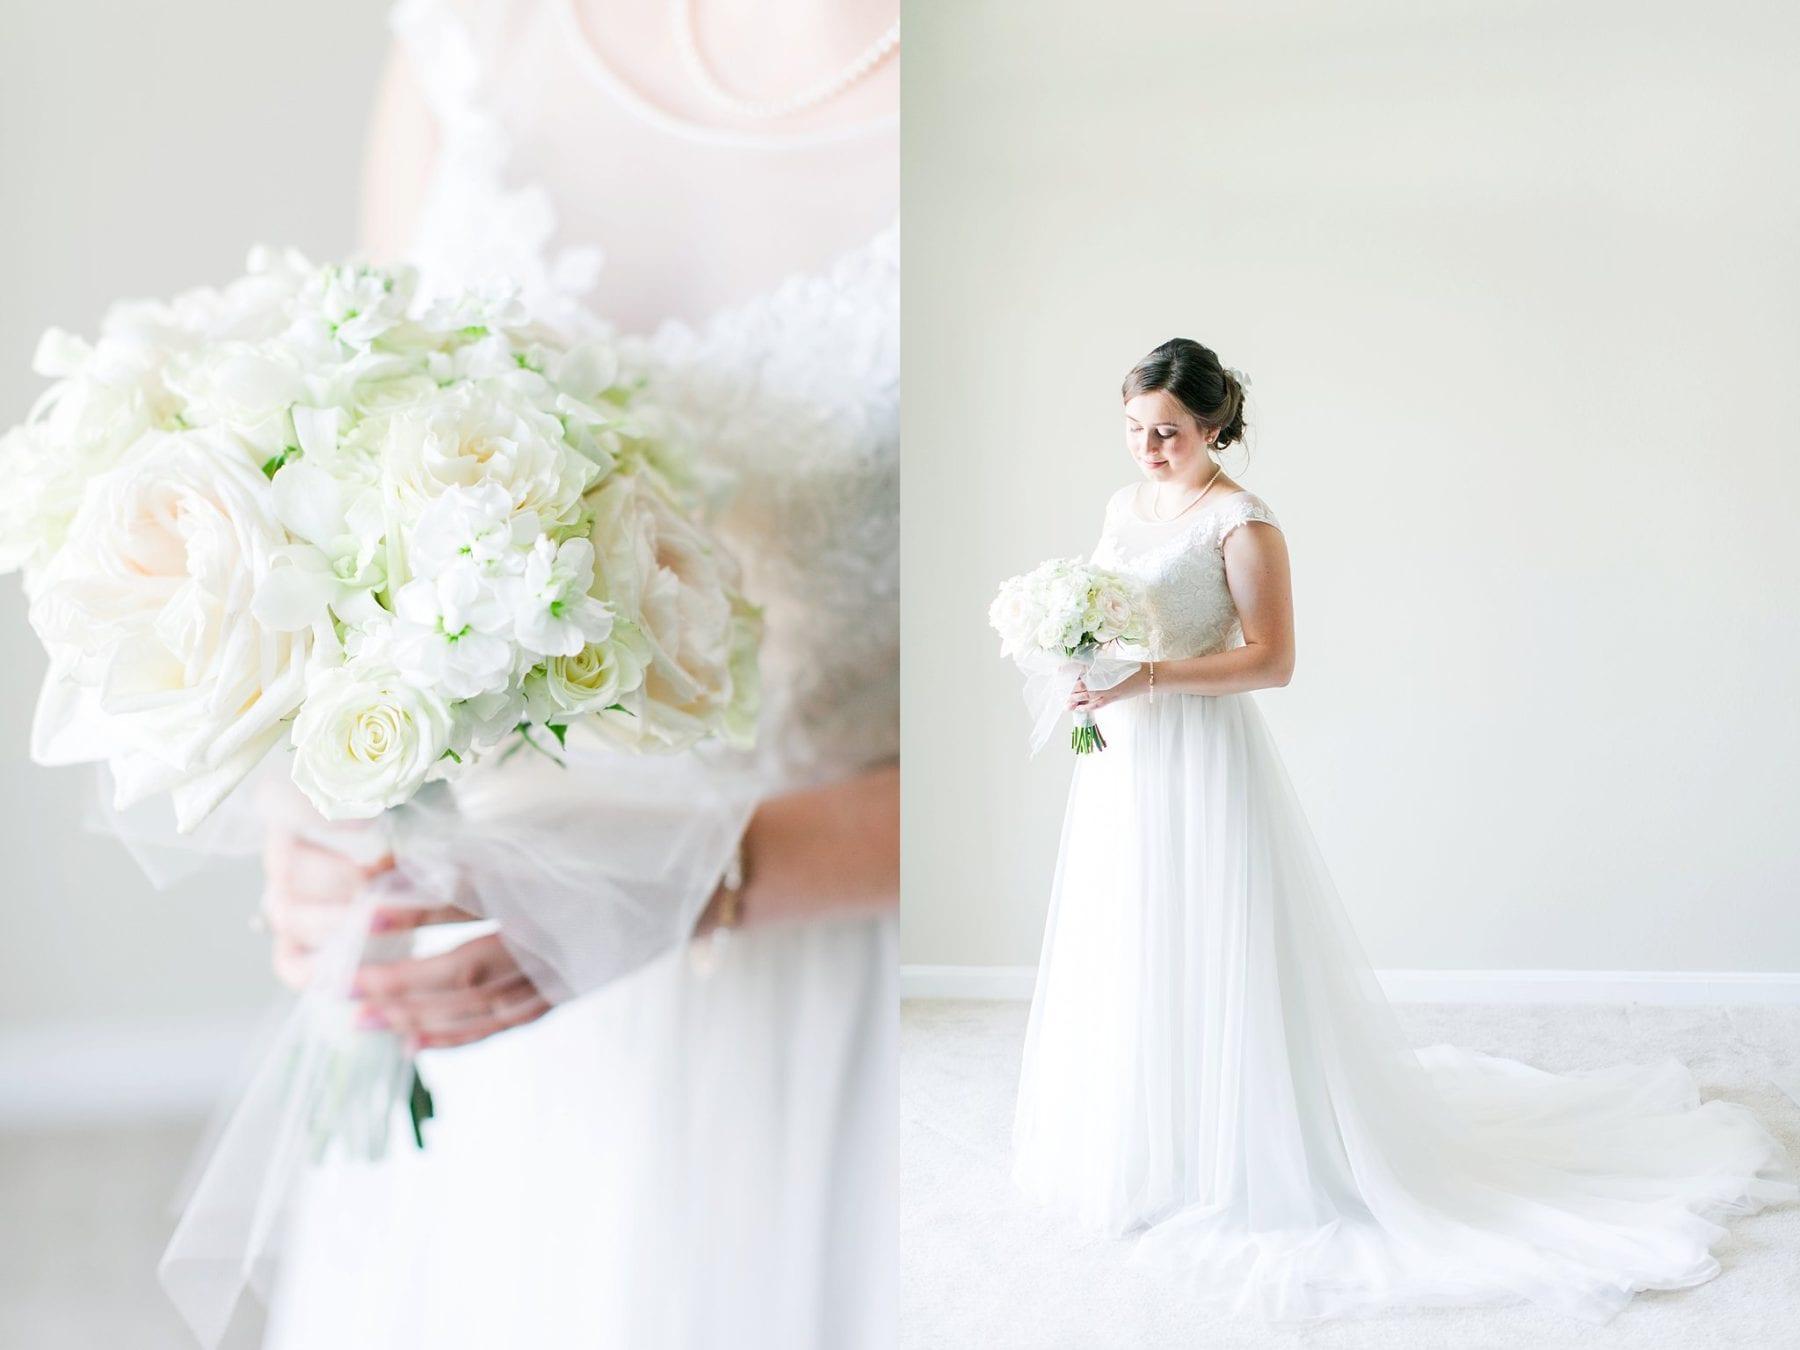 Bristow Manor Wedding Photos Virginia Wedding Photographer Lauren & Andrew Megan Kelsey Photography-98.jpg